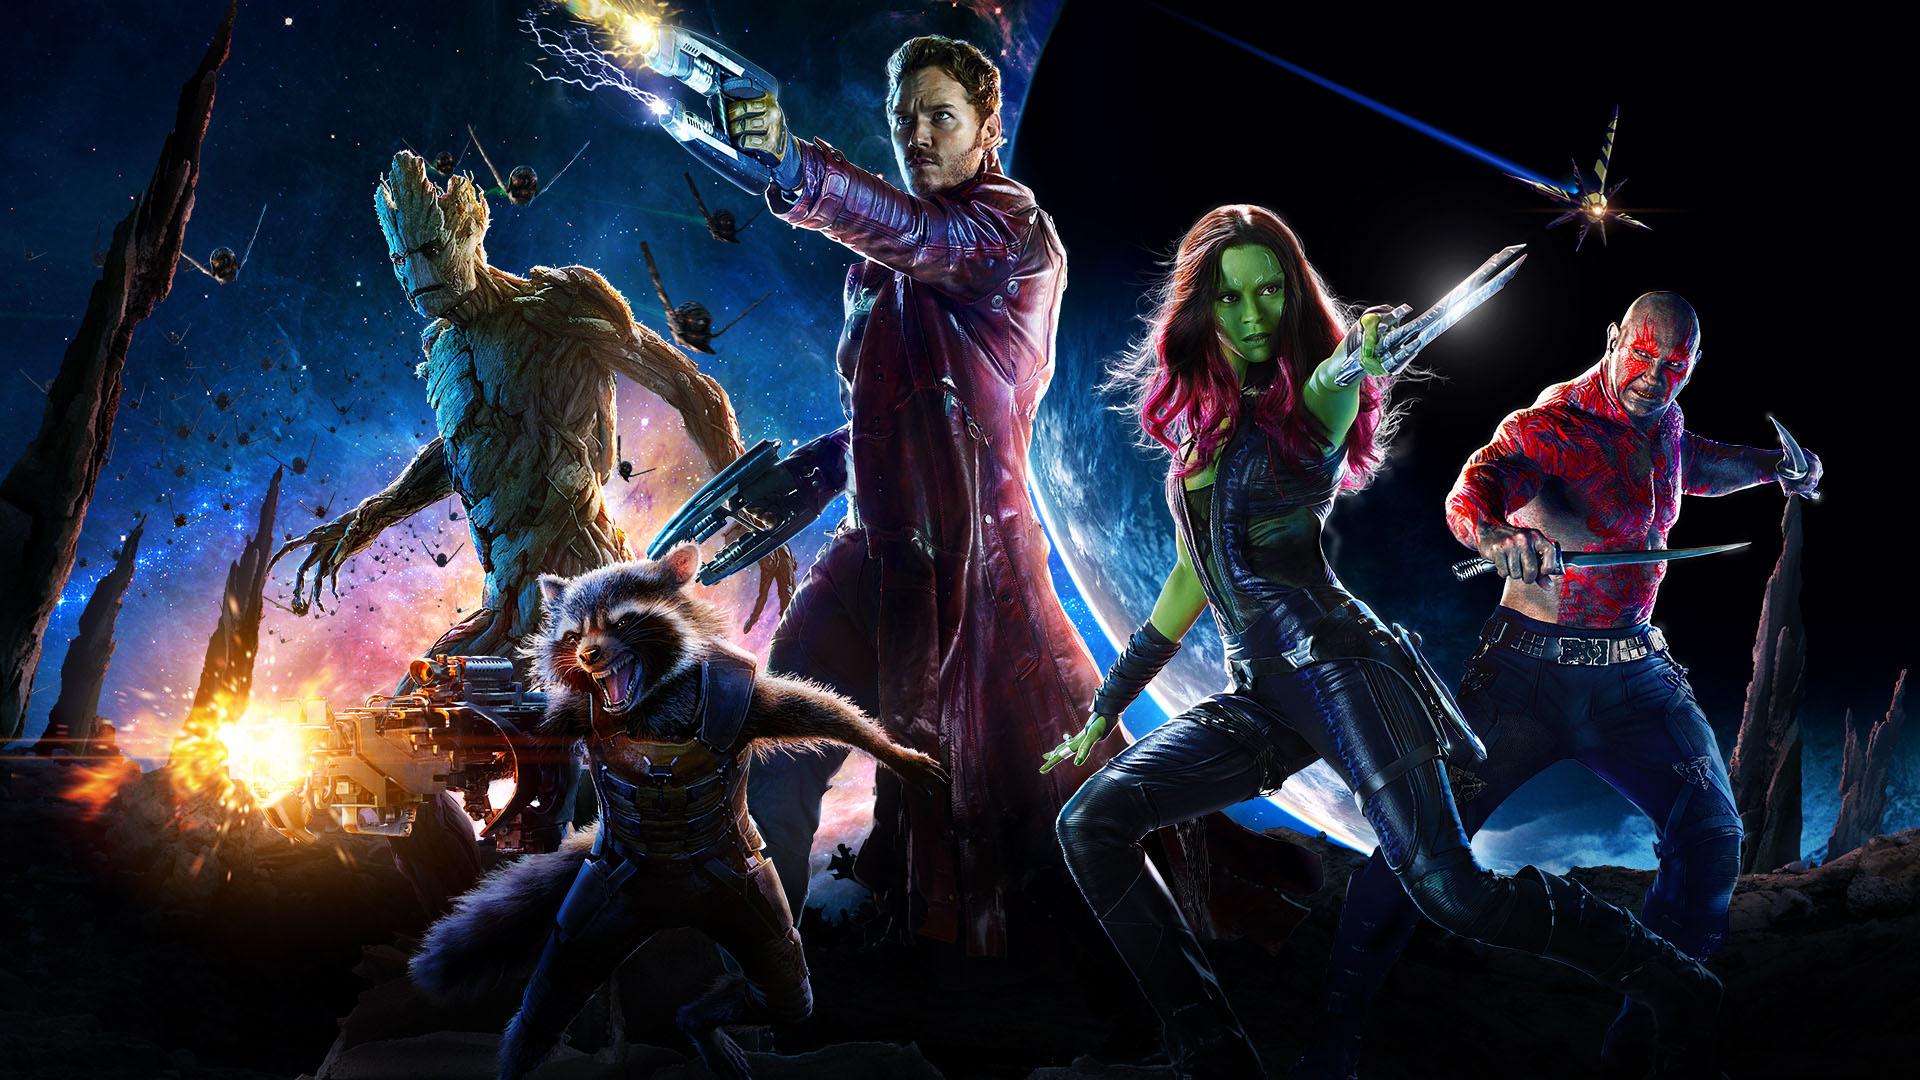 Guardians-of-the-Galaxy-StarLord-Ship-Movies-wallpaper-wp36012054